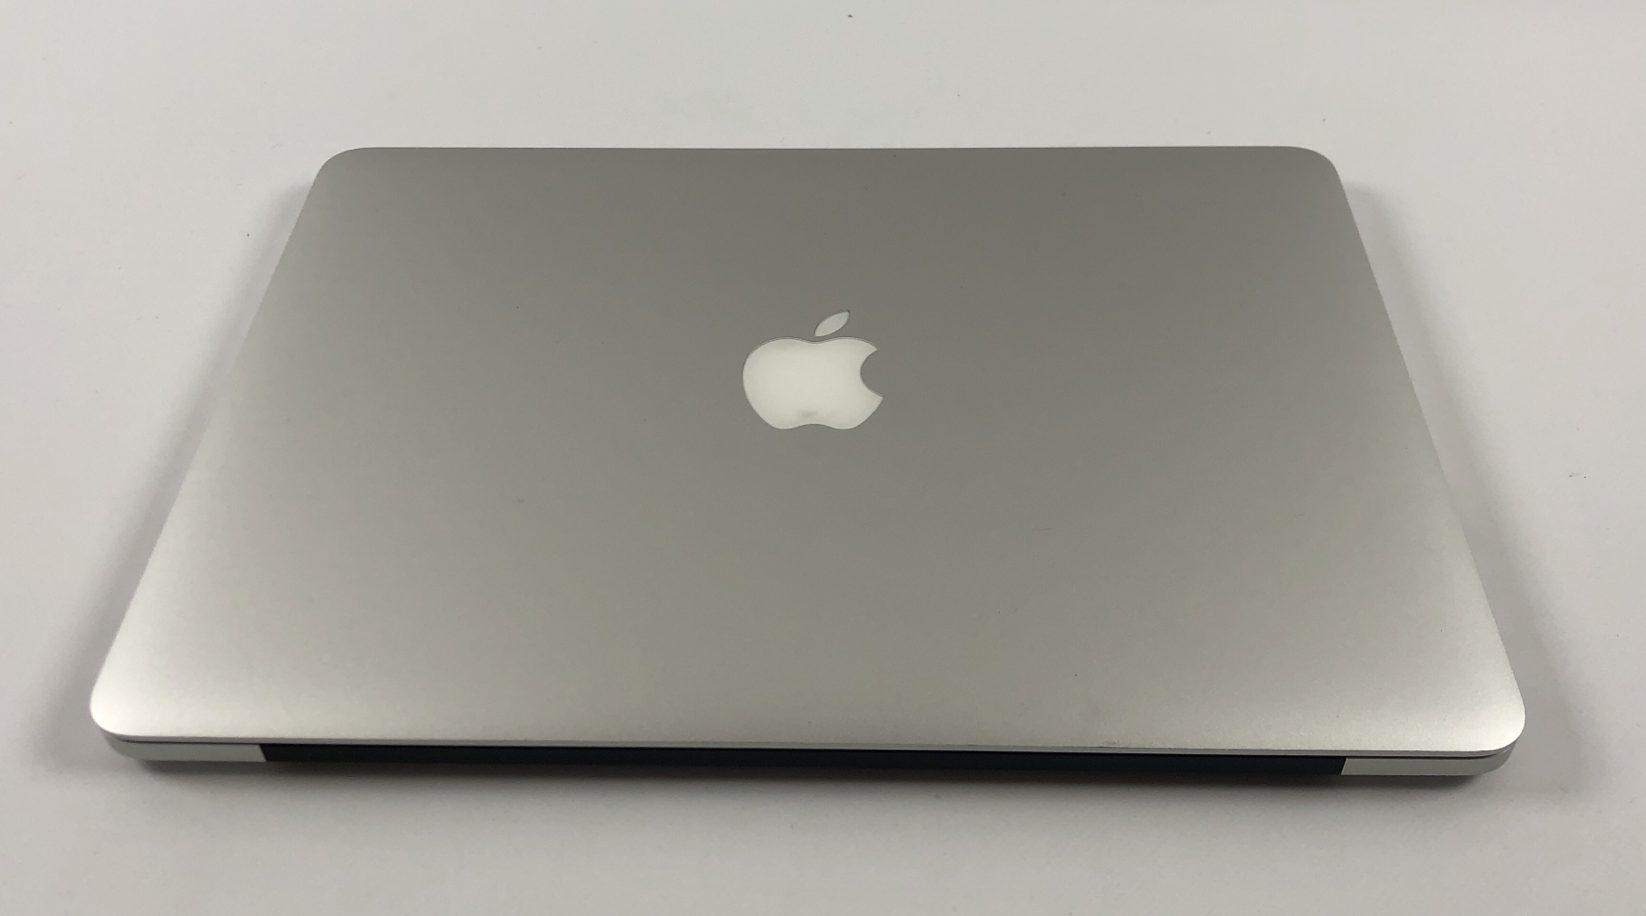 "MacBook Pro Retina 13"" Early 2015 (Intel Core i5 2.9 GHz 8 GB RAM 512 GB SSD), Intel Core i5 2.9 GHz, 8 GB RAM, 512 GB SSD, bild 2"